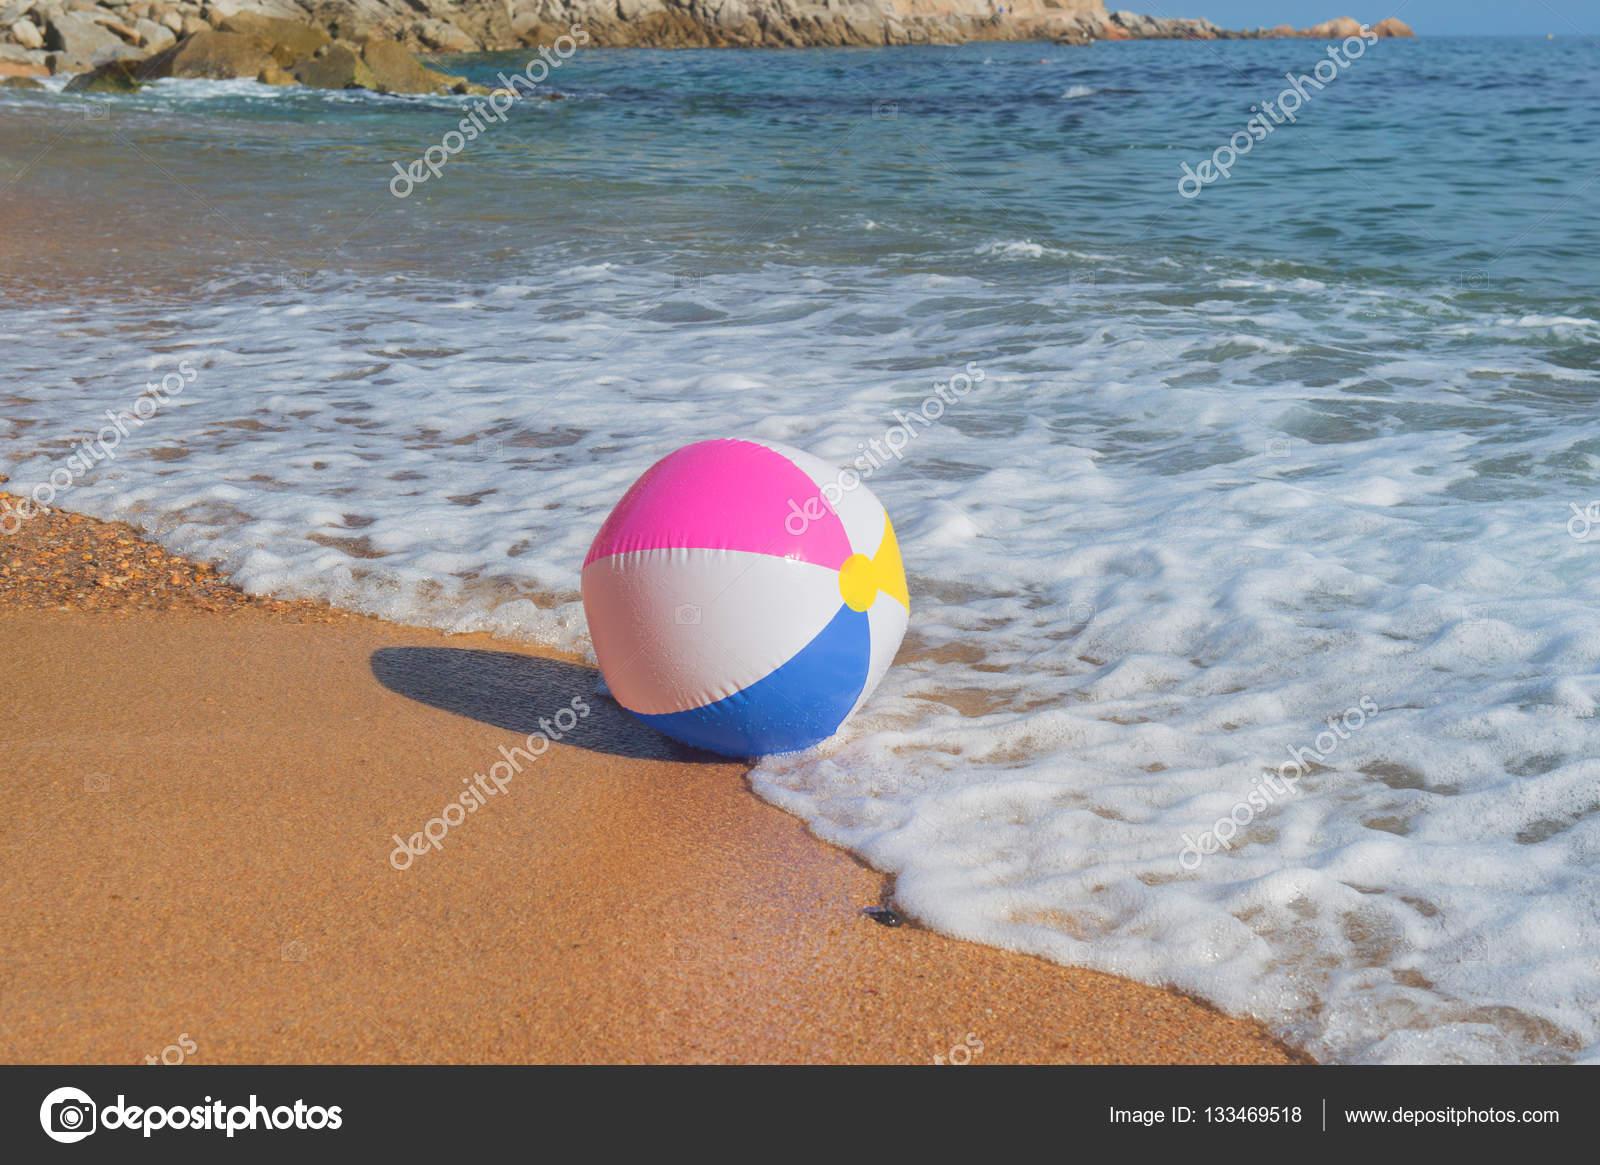 Beach ball in ocean Broken Beach Ball In Sea Stock Photo Shore Points Mom Beach Ball In Sea Stock Photo Ivonnewierink 133469518